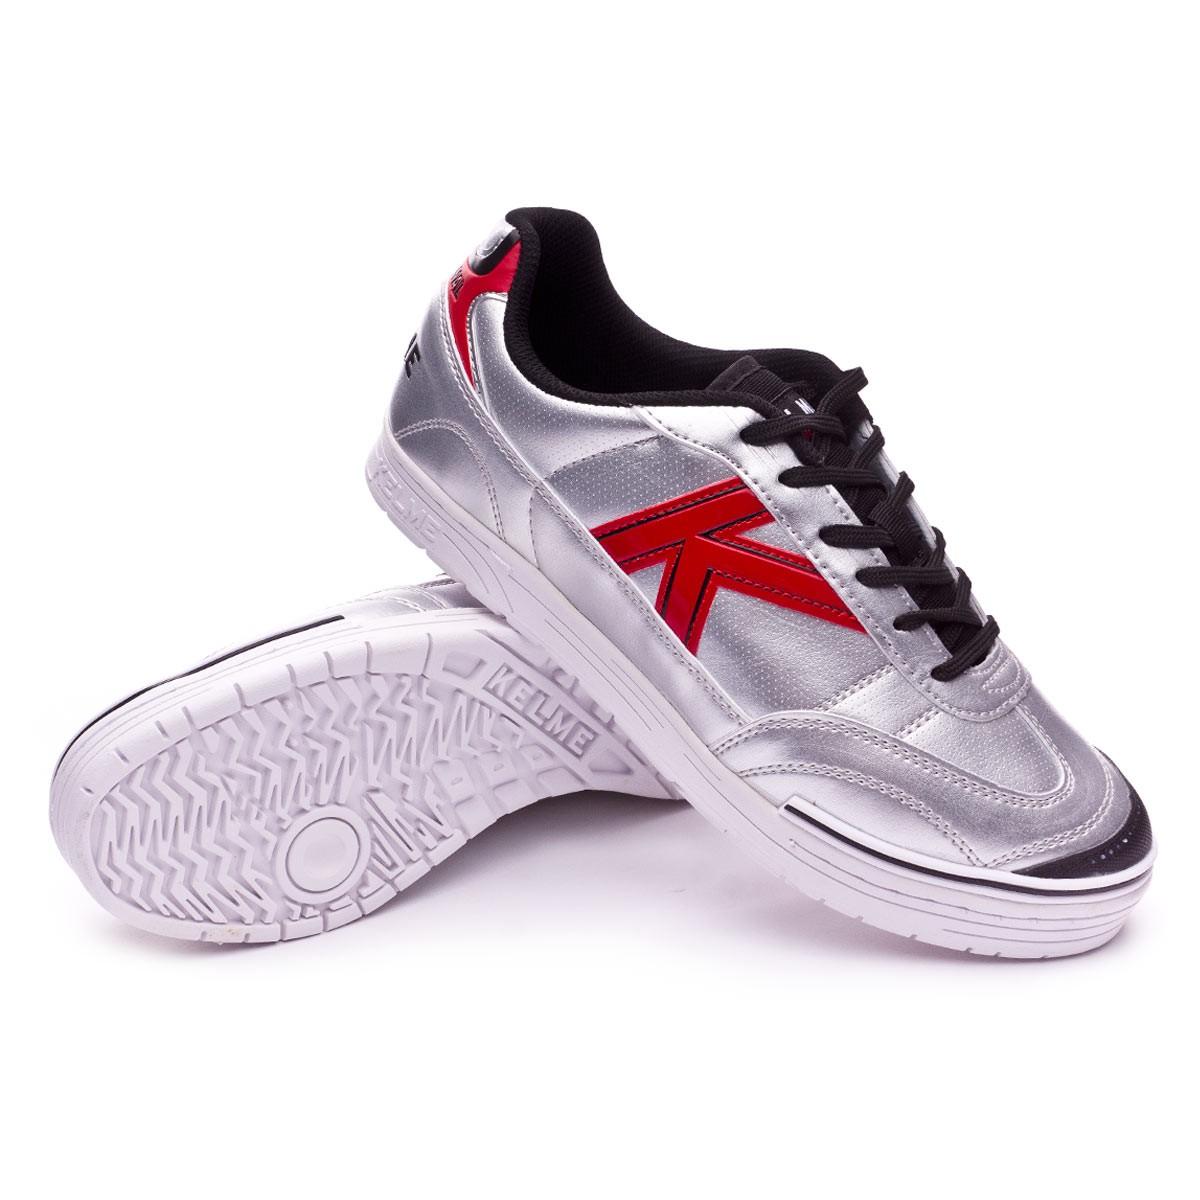 053cd2007ce Futsal Boot Kelme Trueno Sala S Silver - Football store Fútbol Emotion